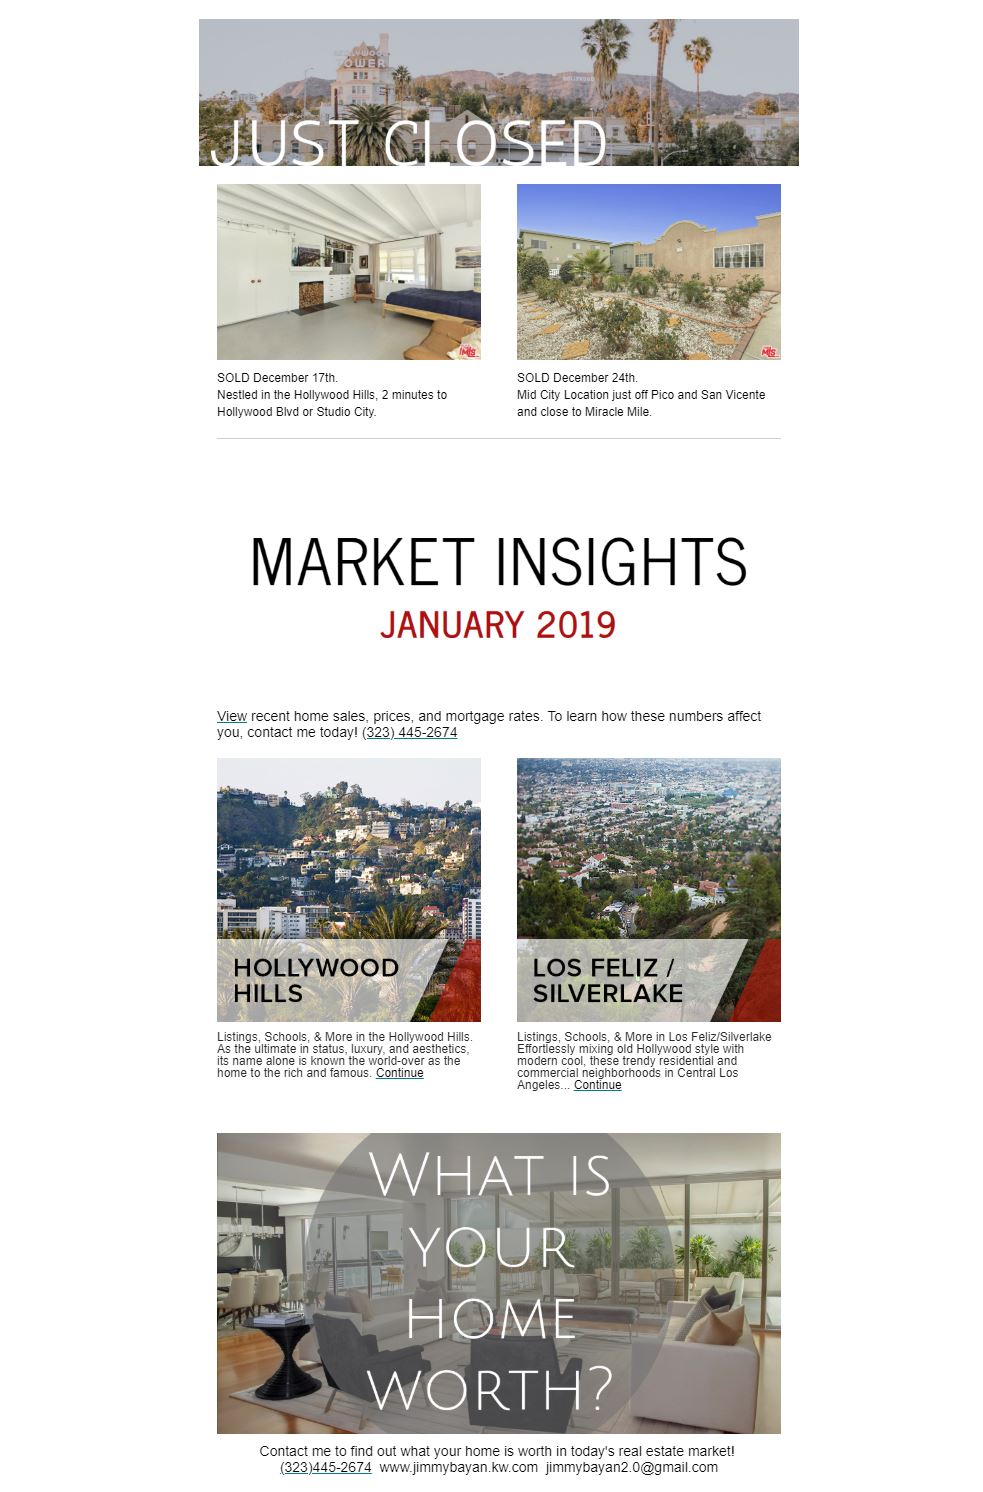 Mailchimp newsletter for Los Angeles real estate agent 2